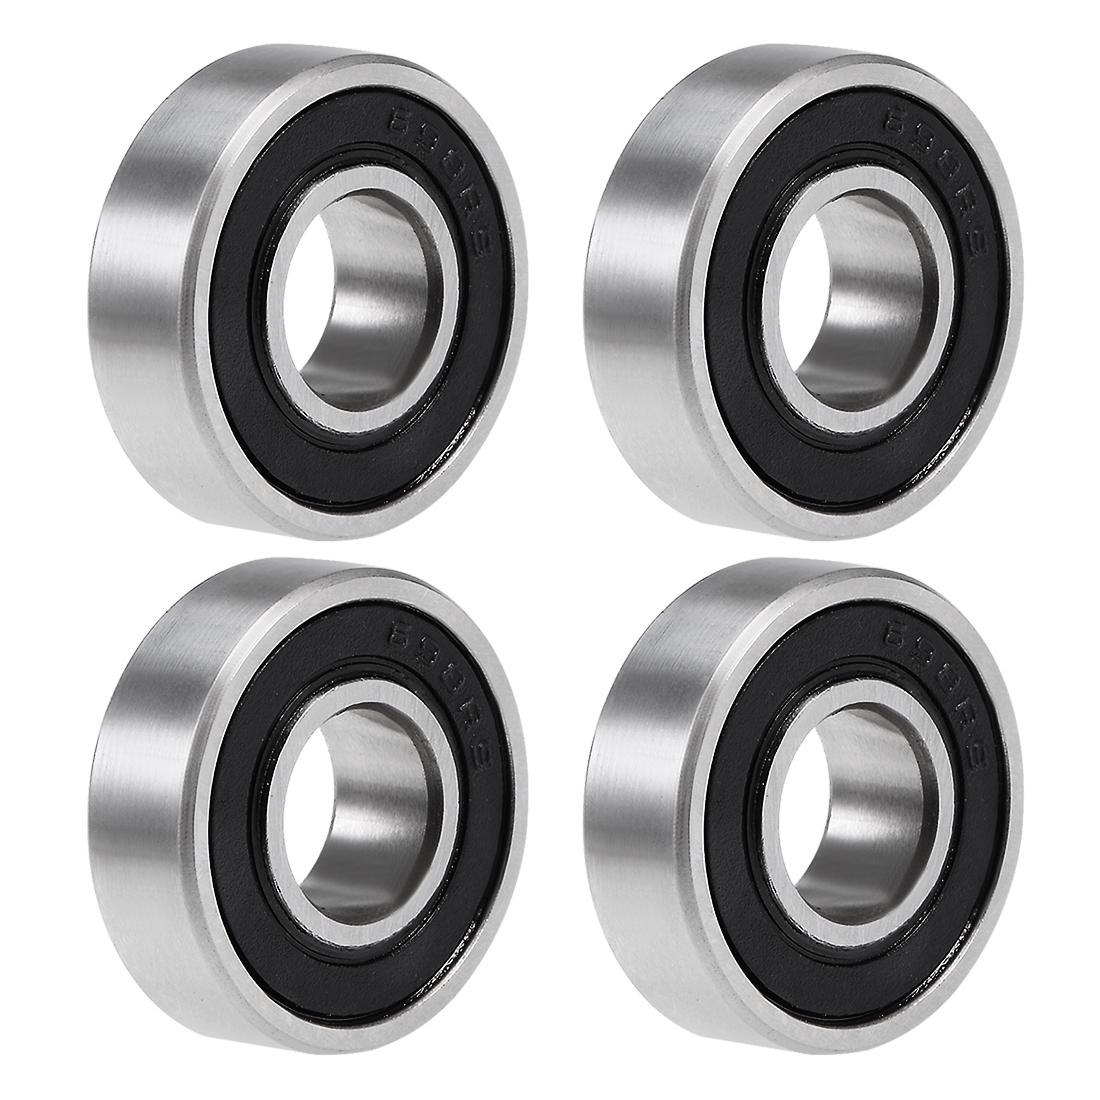 698-2RS Deep Groove Ball Bearing 8x19x6mm Double Sealed Chrome Bearings 4pcs